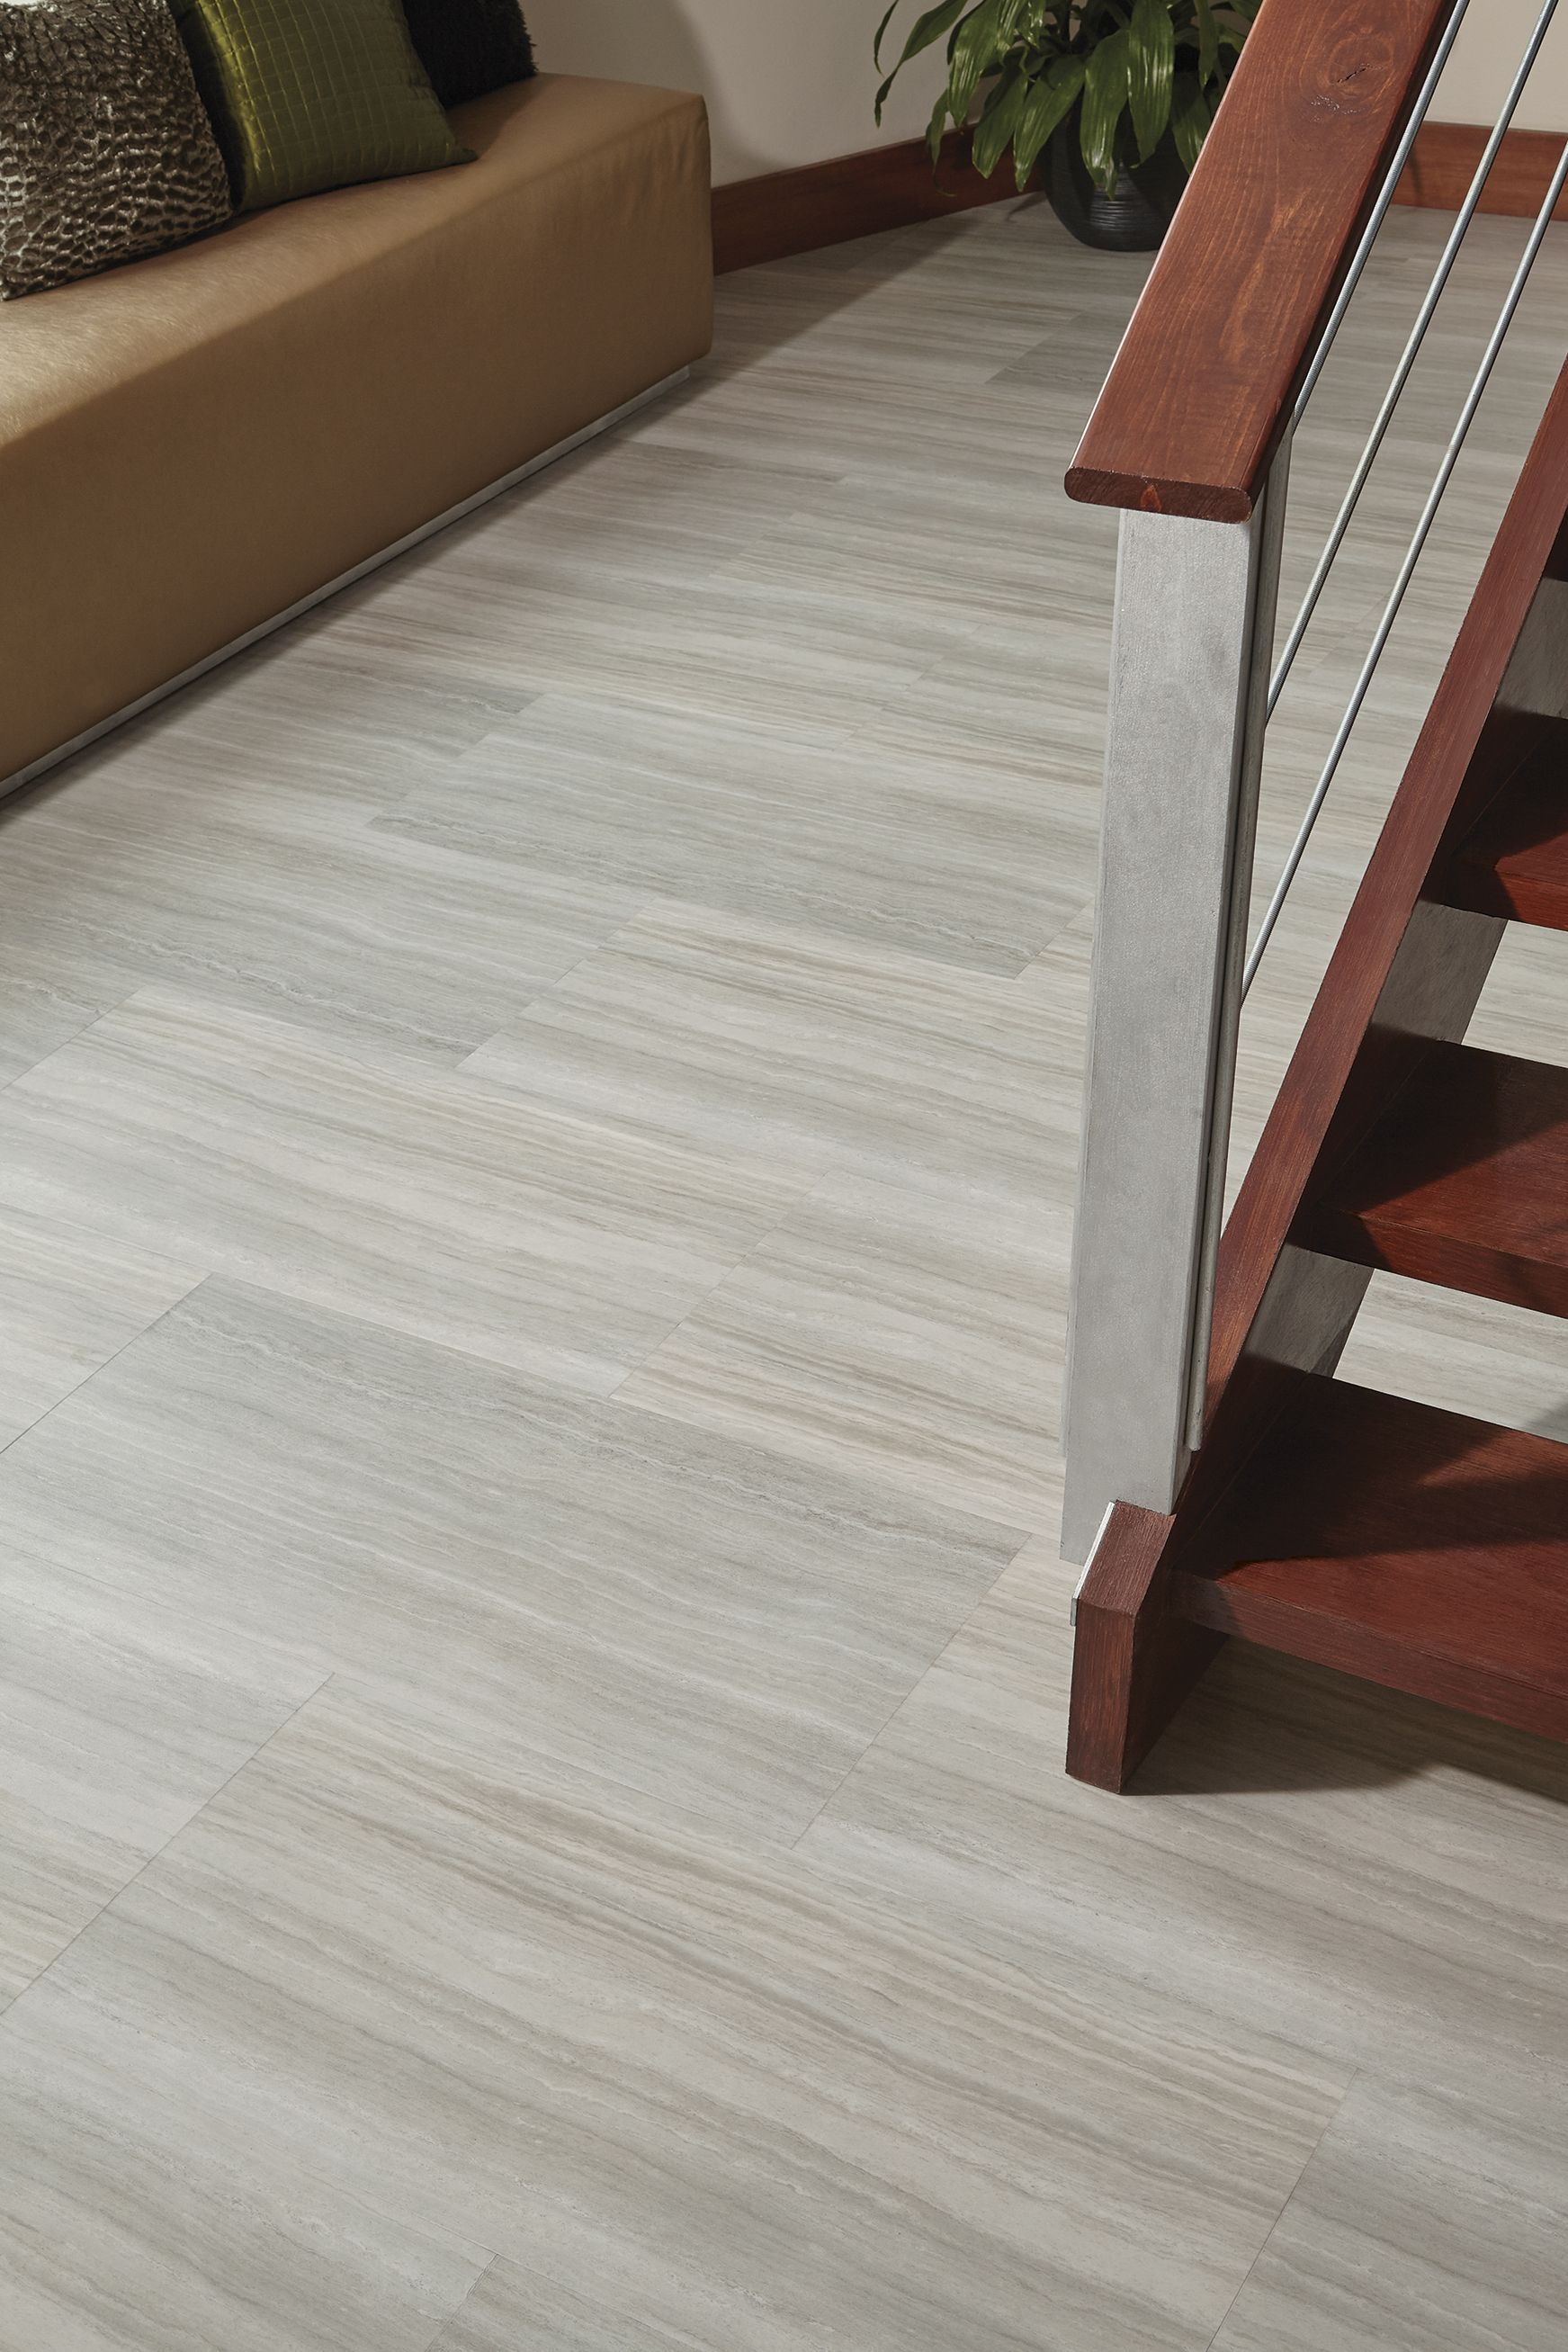 Unique Floating Interlocking Basement Flooring Tiles